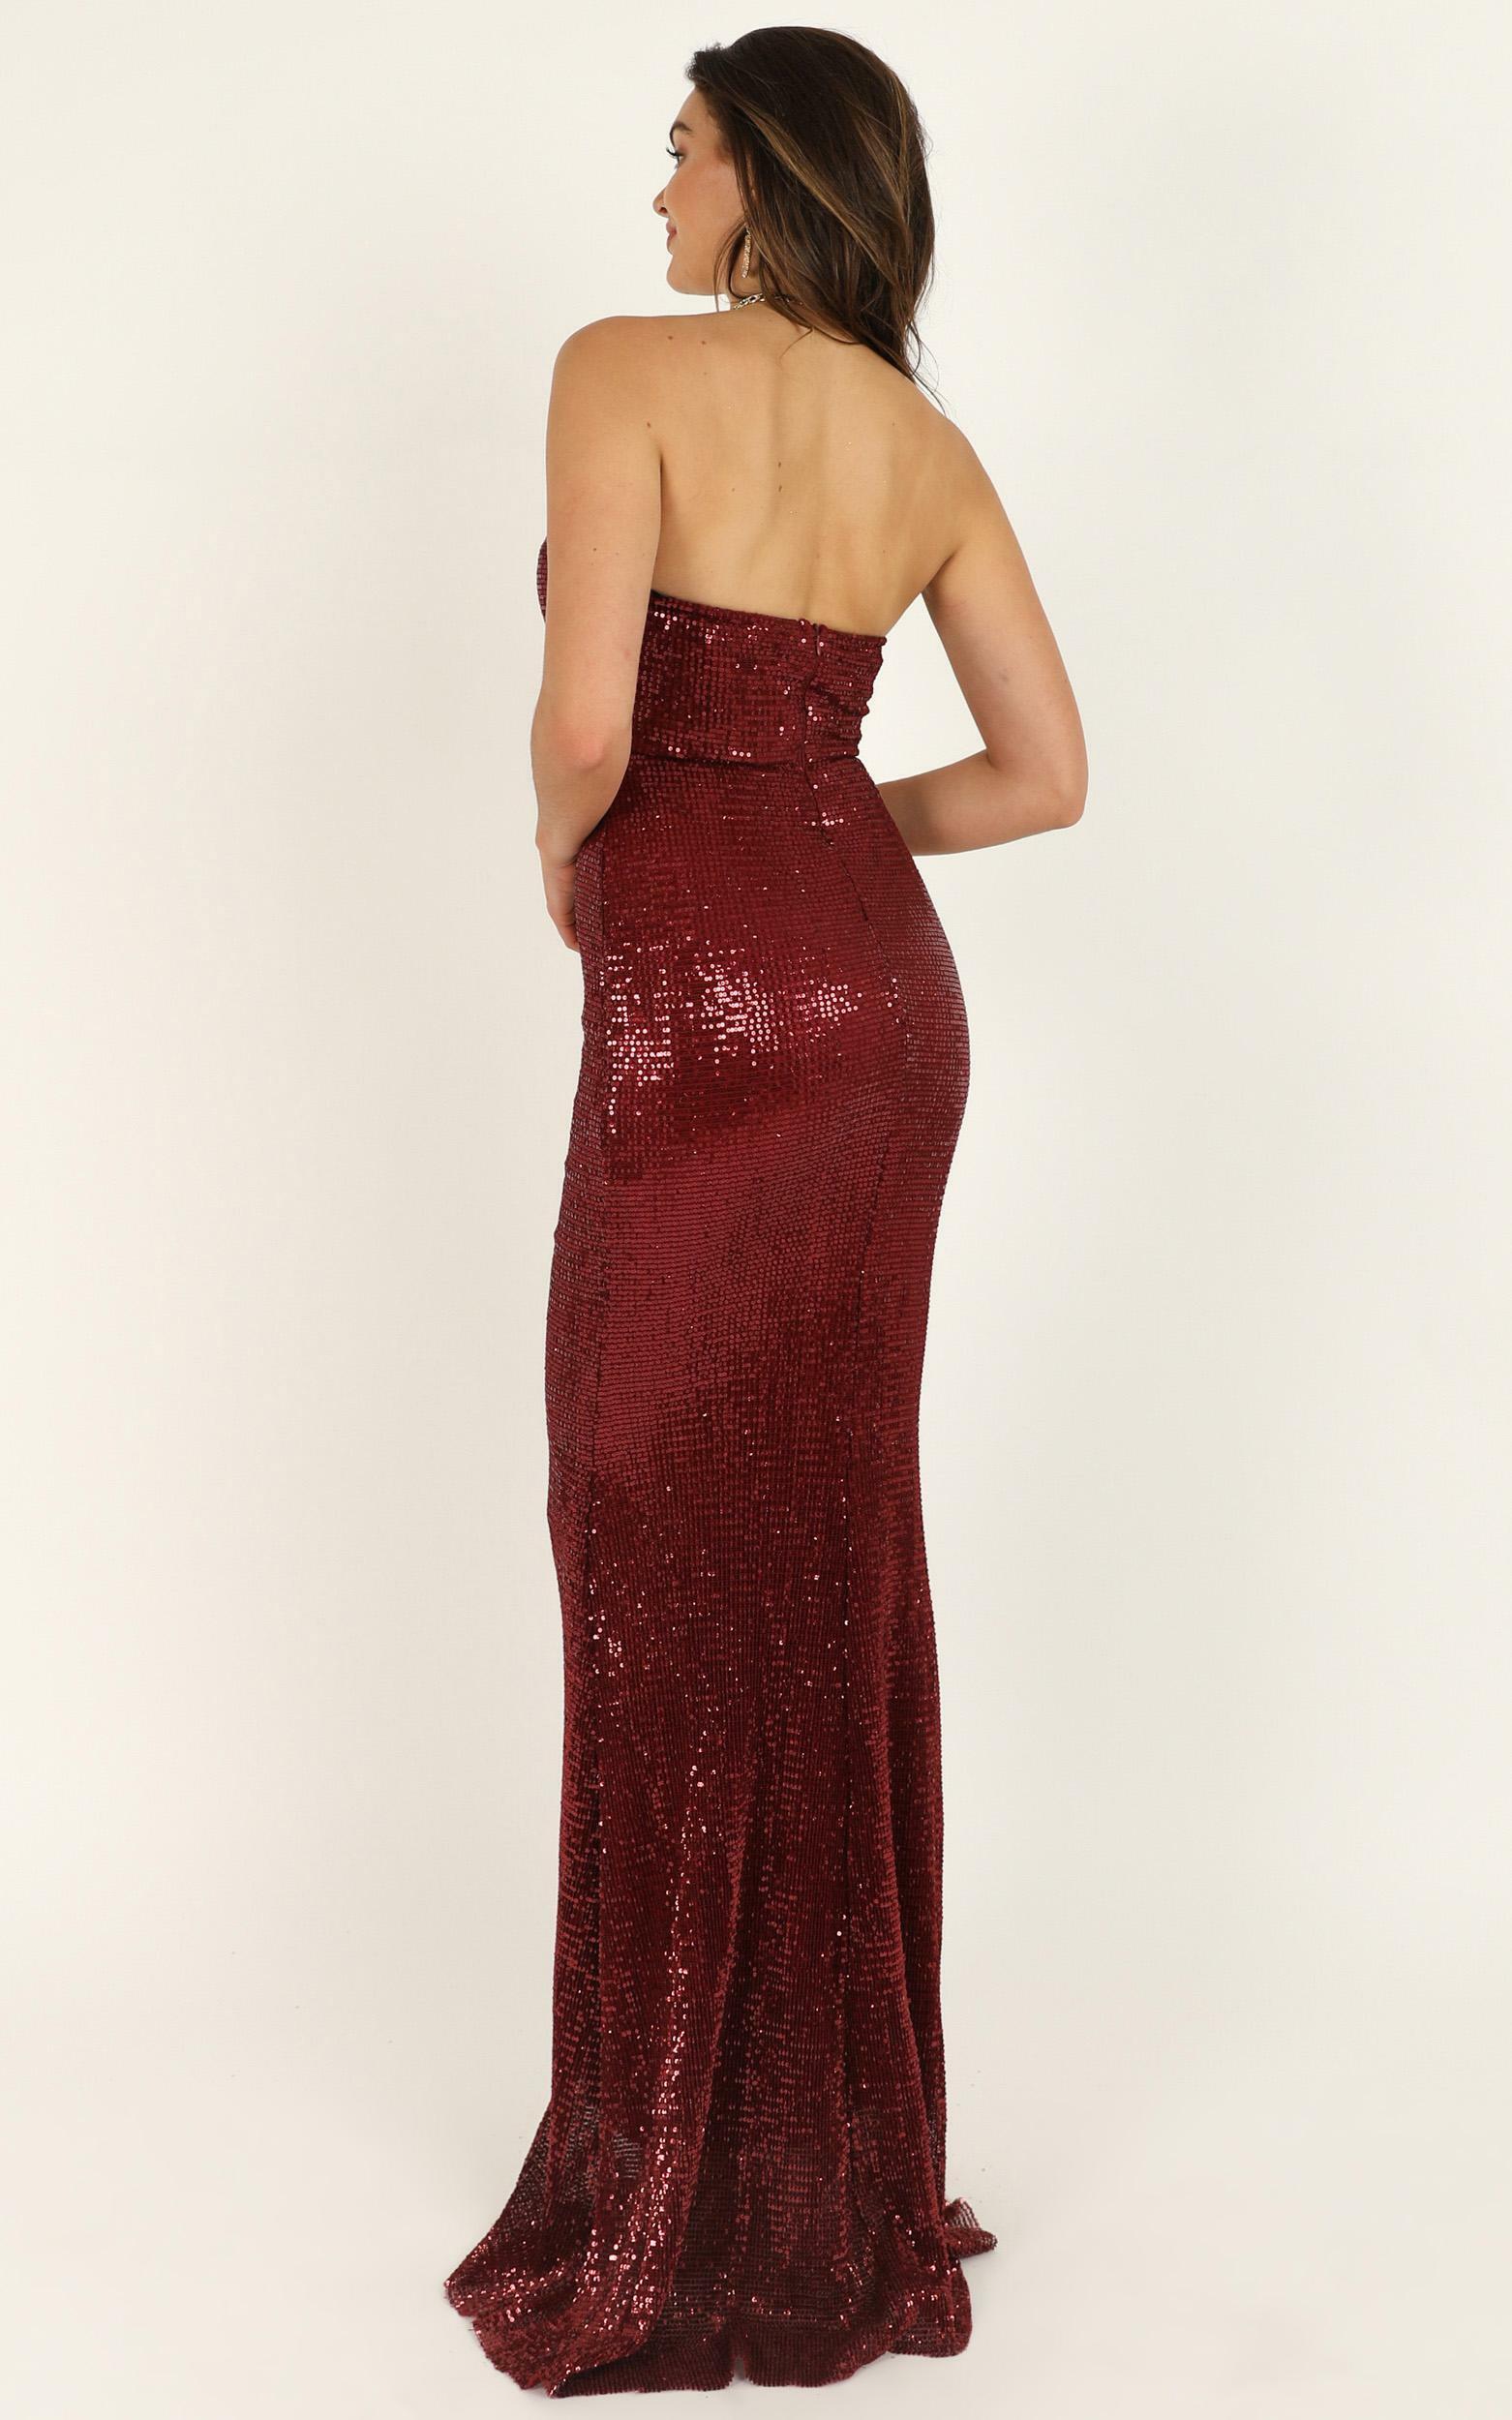 Sky Of Sparklers dress in wine sequin - 12 (L), Wine, hi-res image number null